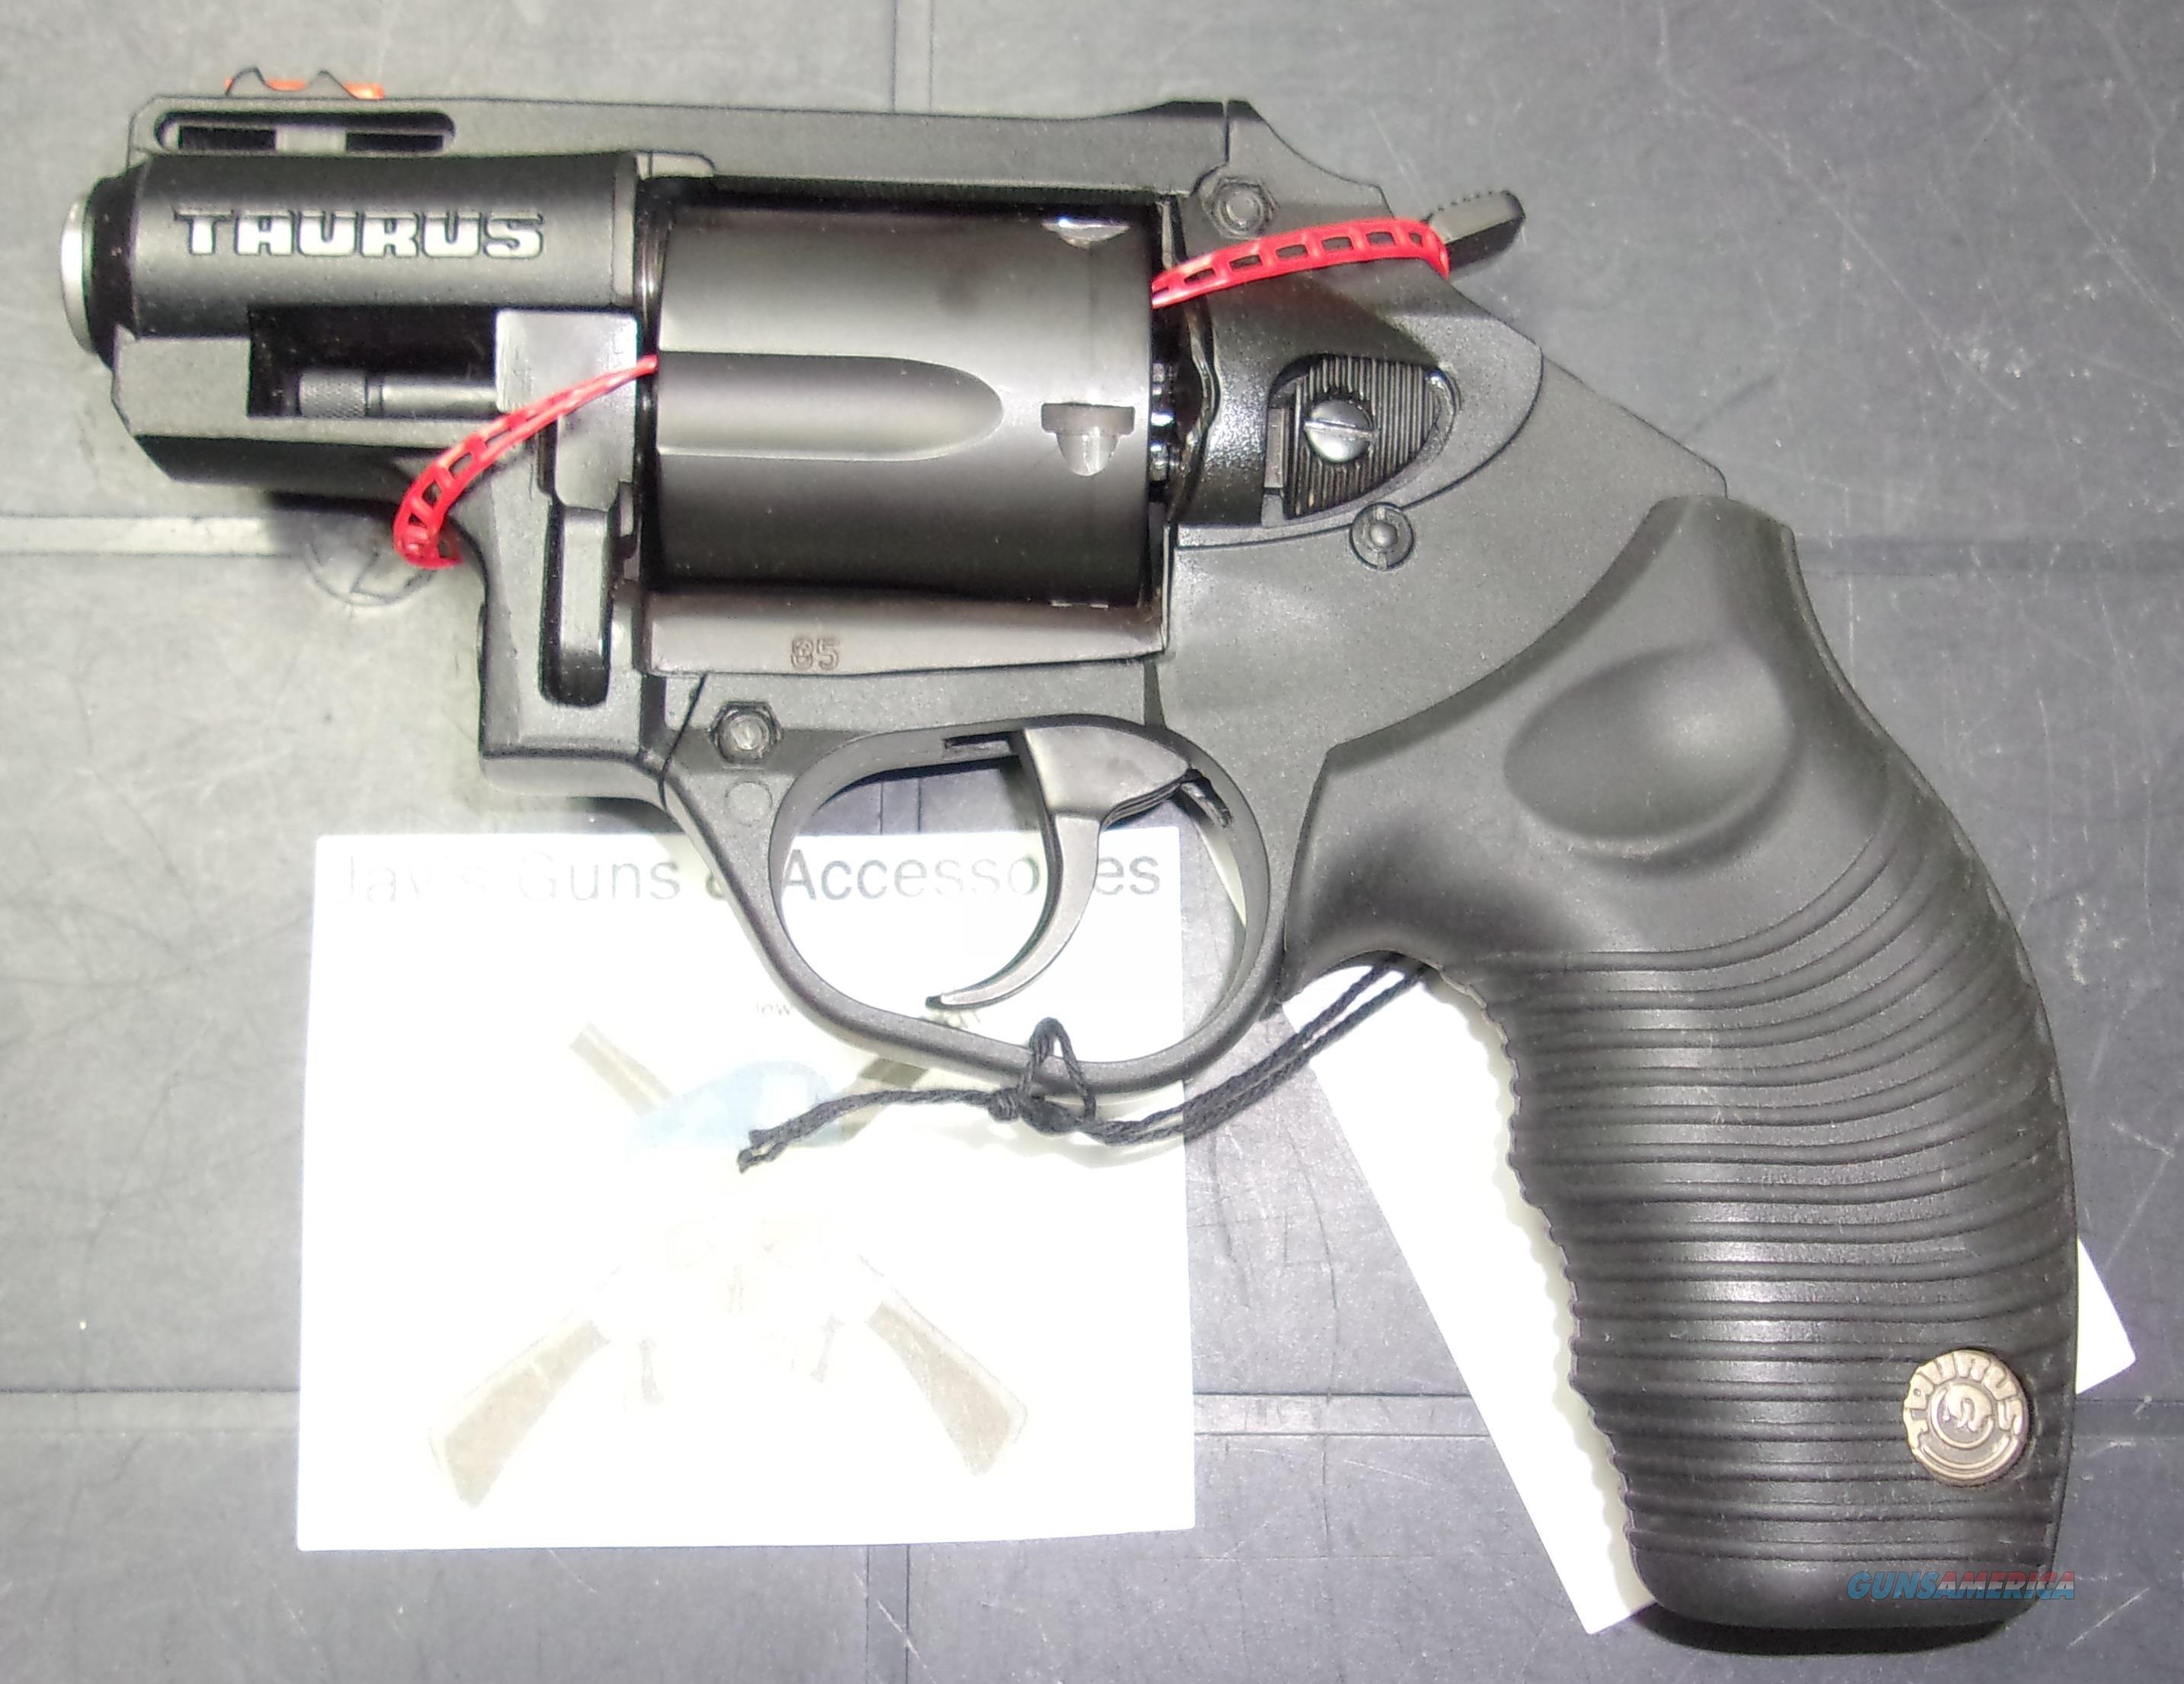 Taurus 85 Protector Poly  Guns > Pistols > Taurus Pistols > Revolvers